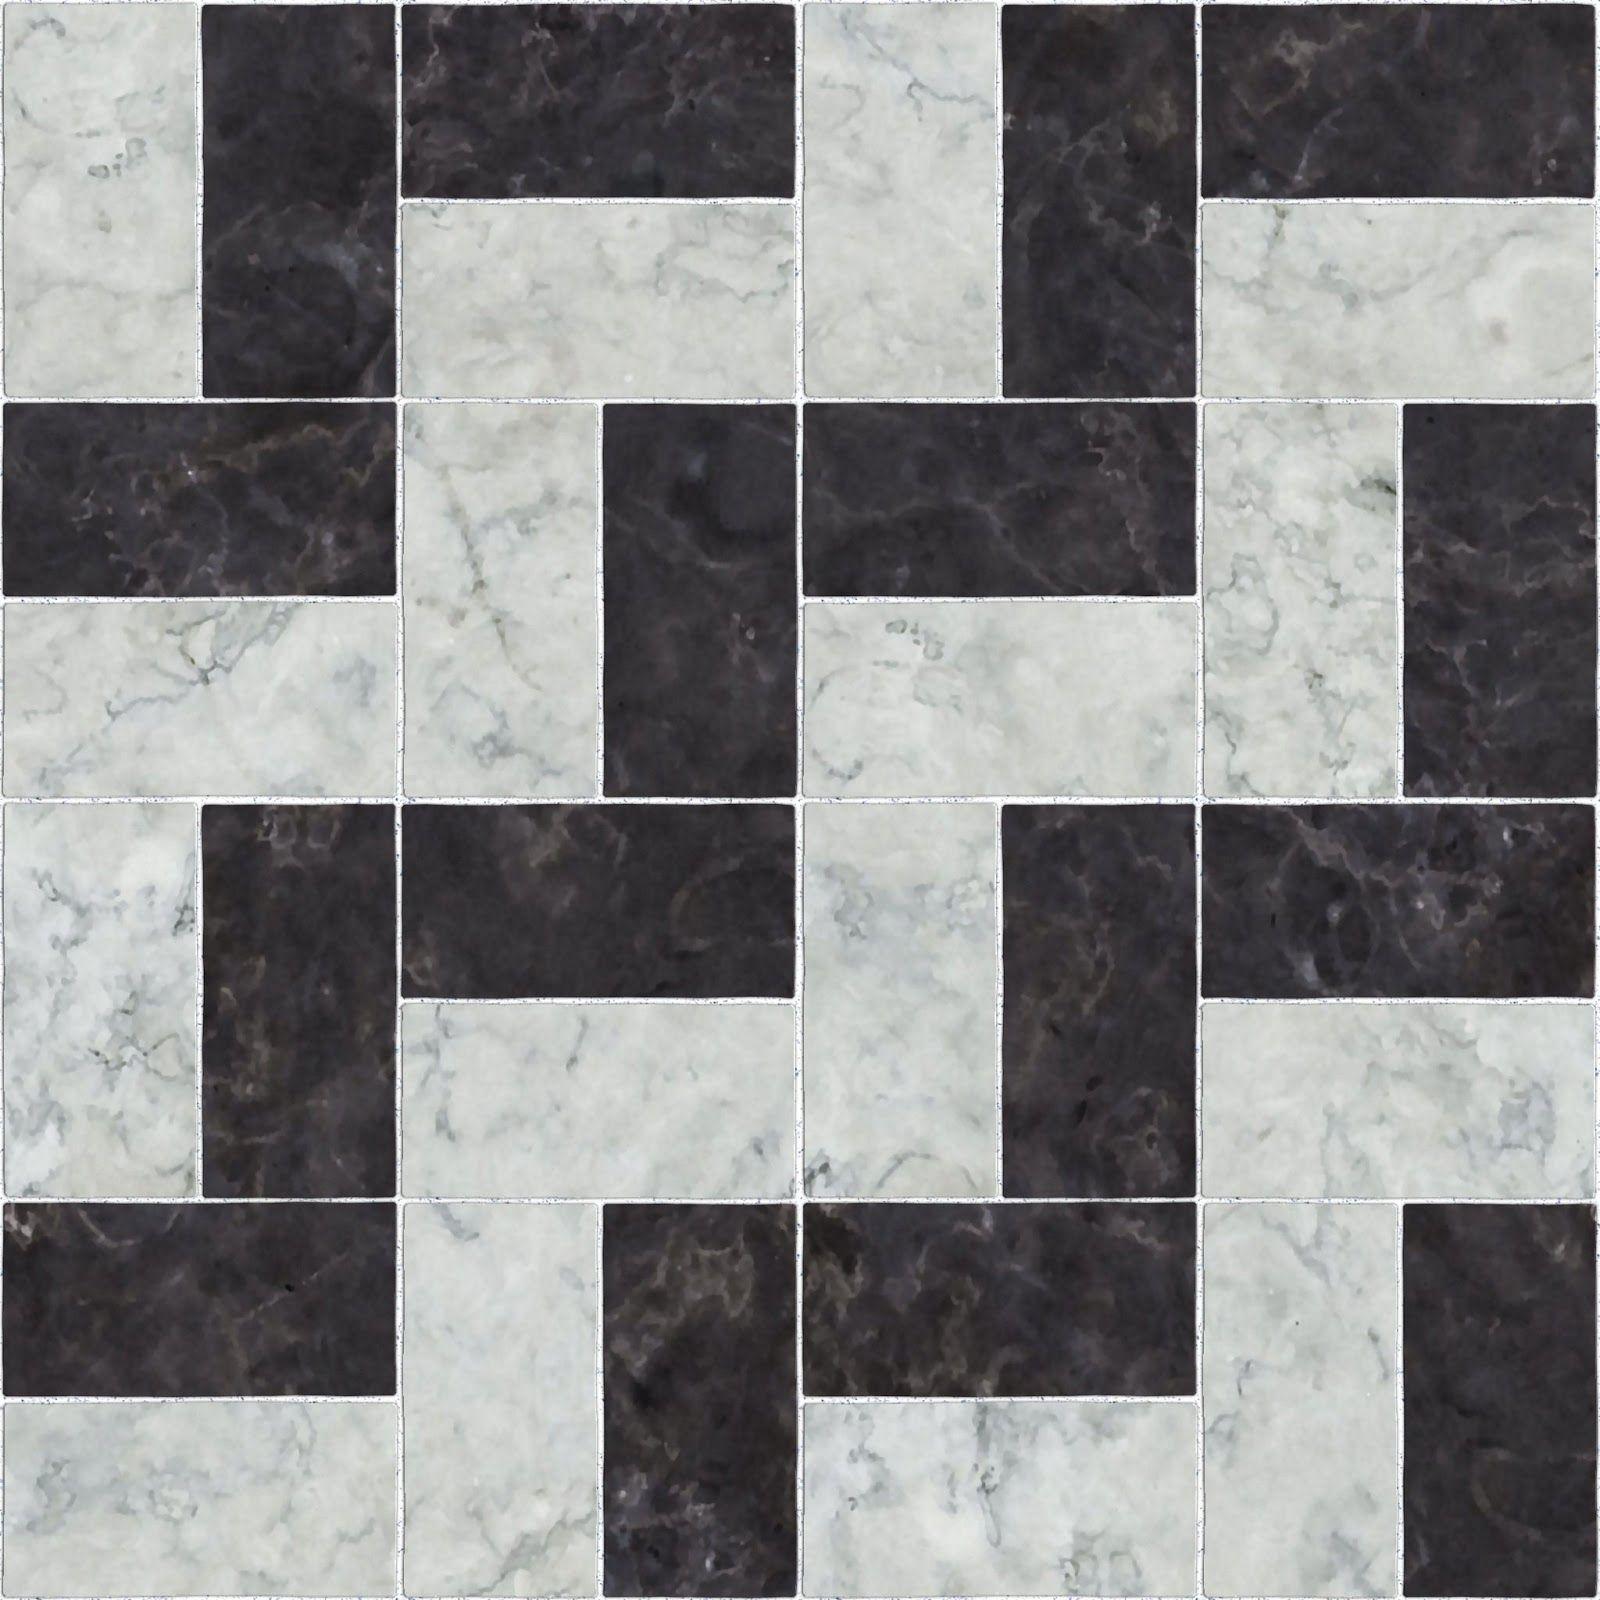 High Resolution Textures Marble Marble Textures Texture Tile Floor Seamless Modern Tileable Kitchen Resolut In 2020 Tile Floor Modern Marble Tile Marble Floor Pattern